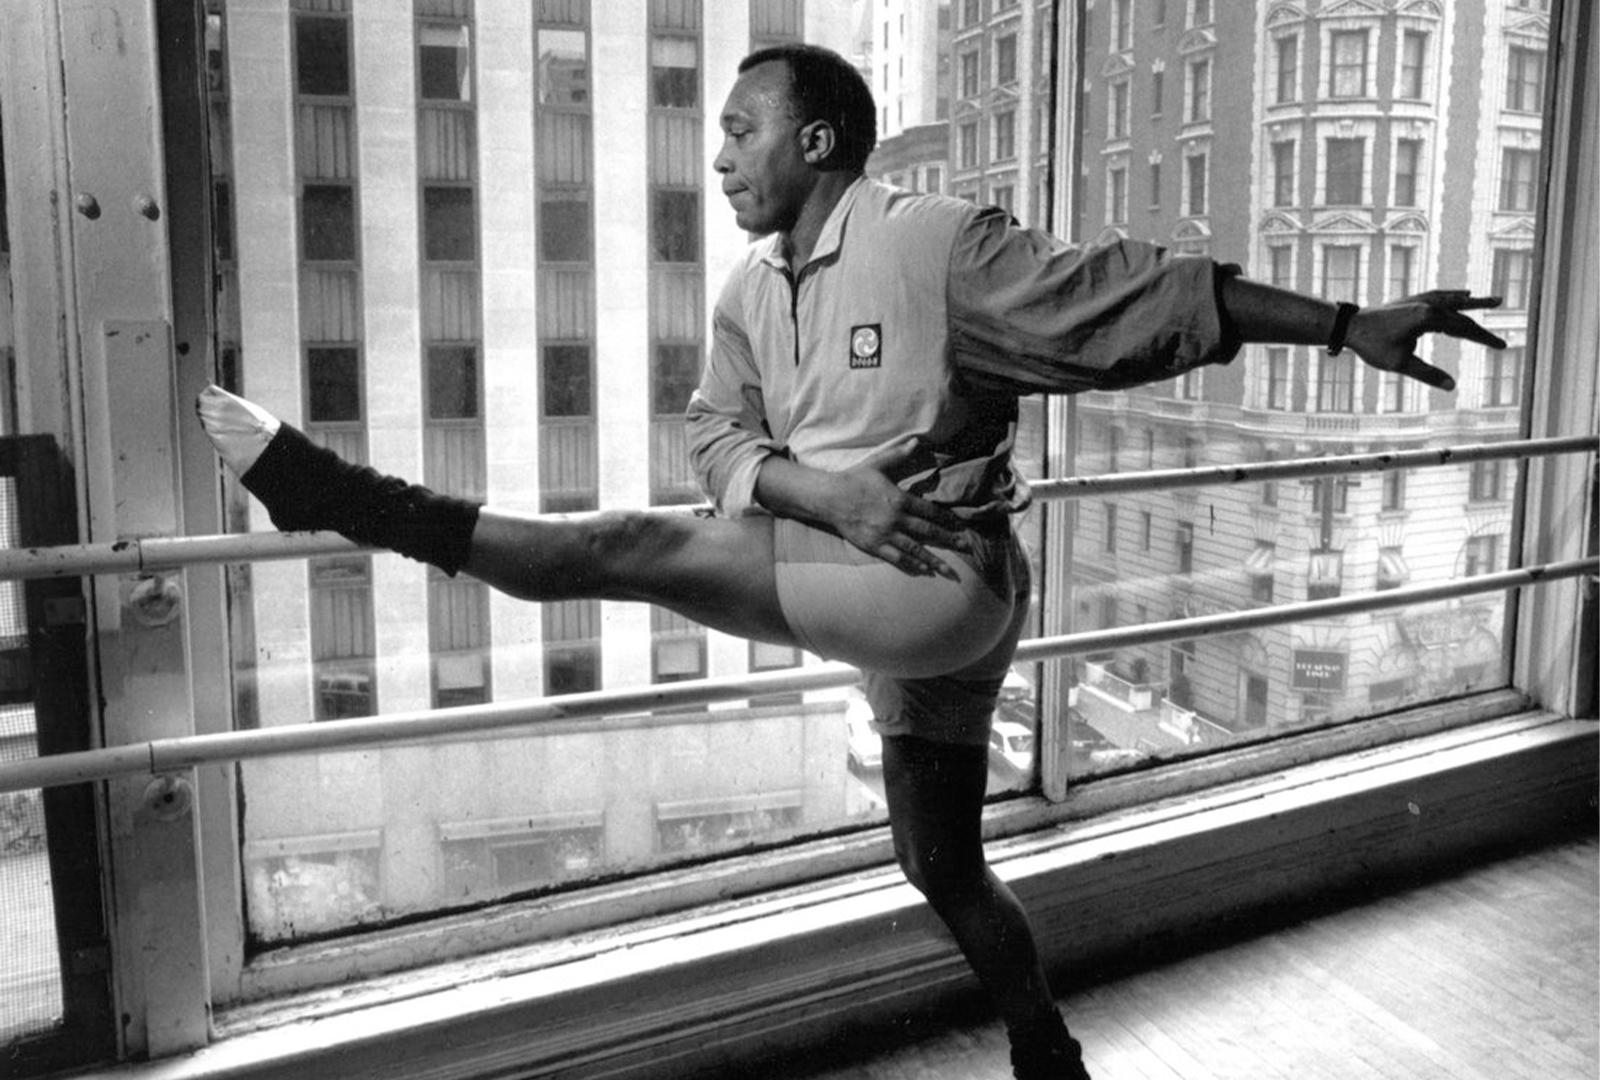 Jazz dancer Frank Hatchett celebrated in new compilation, Sensational!